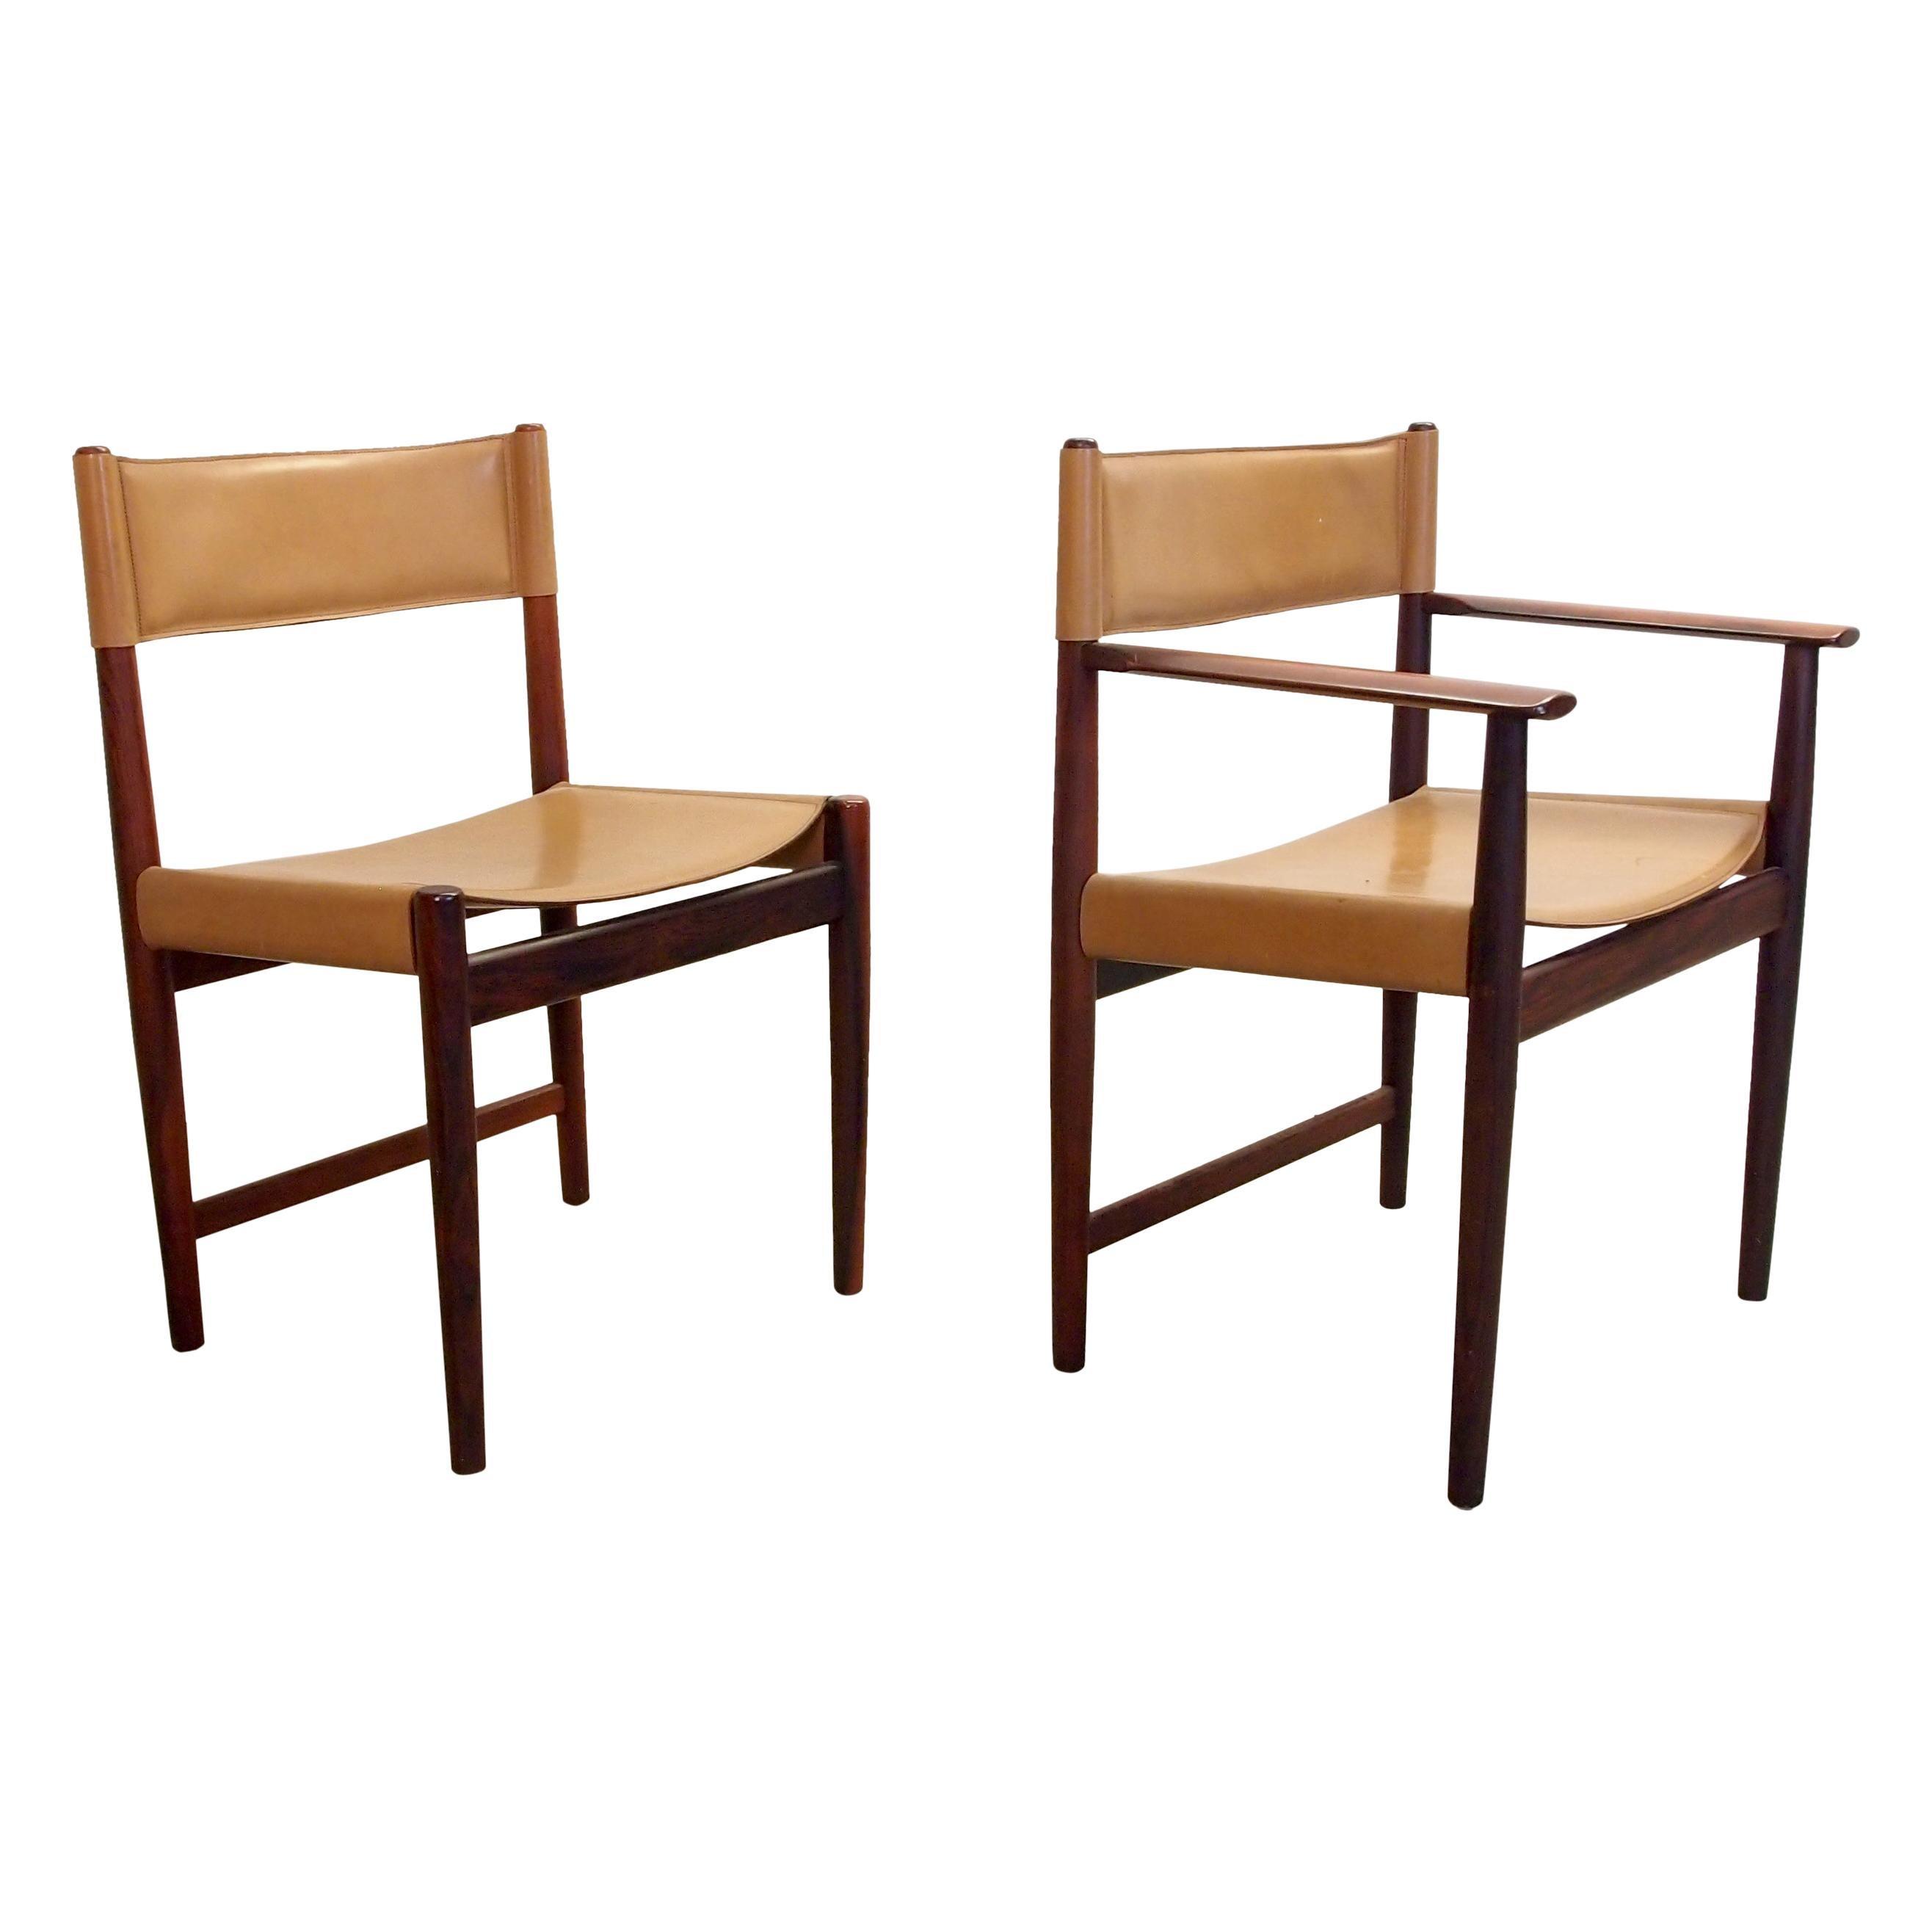 Set 4 Midcentury Pallisander Chairs by Kurt Ostervig for Sibast Furniture